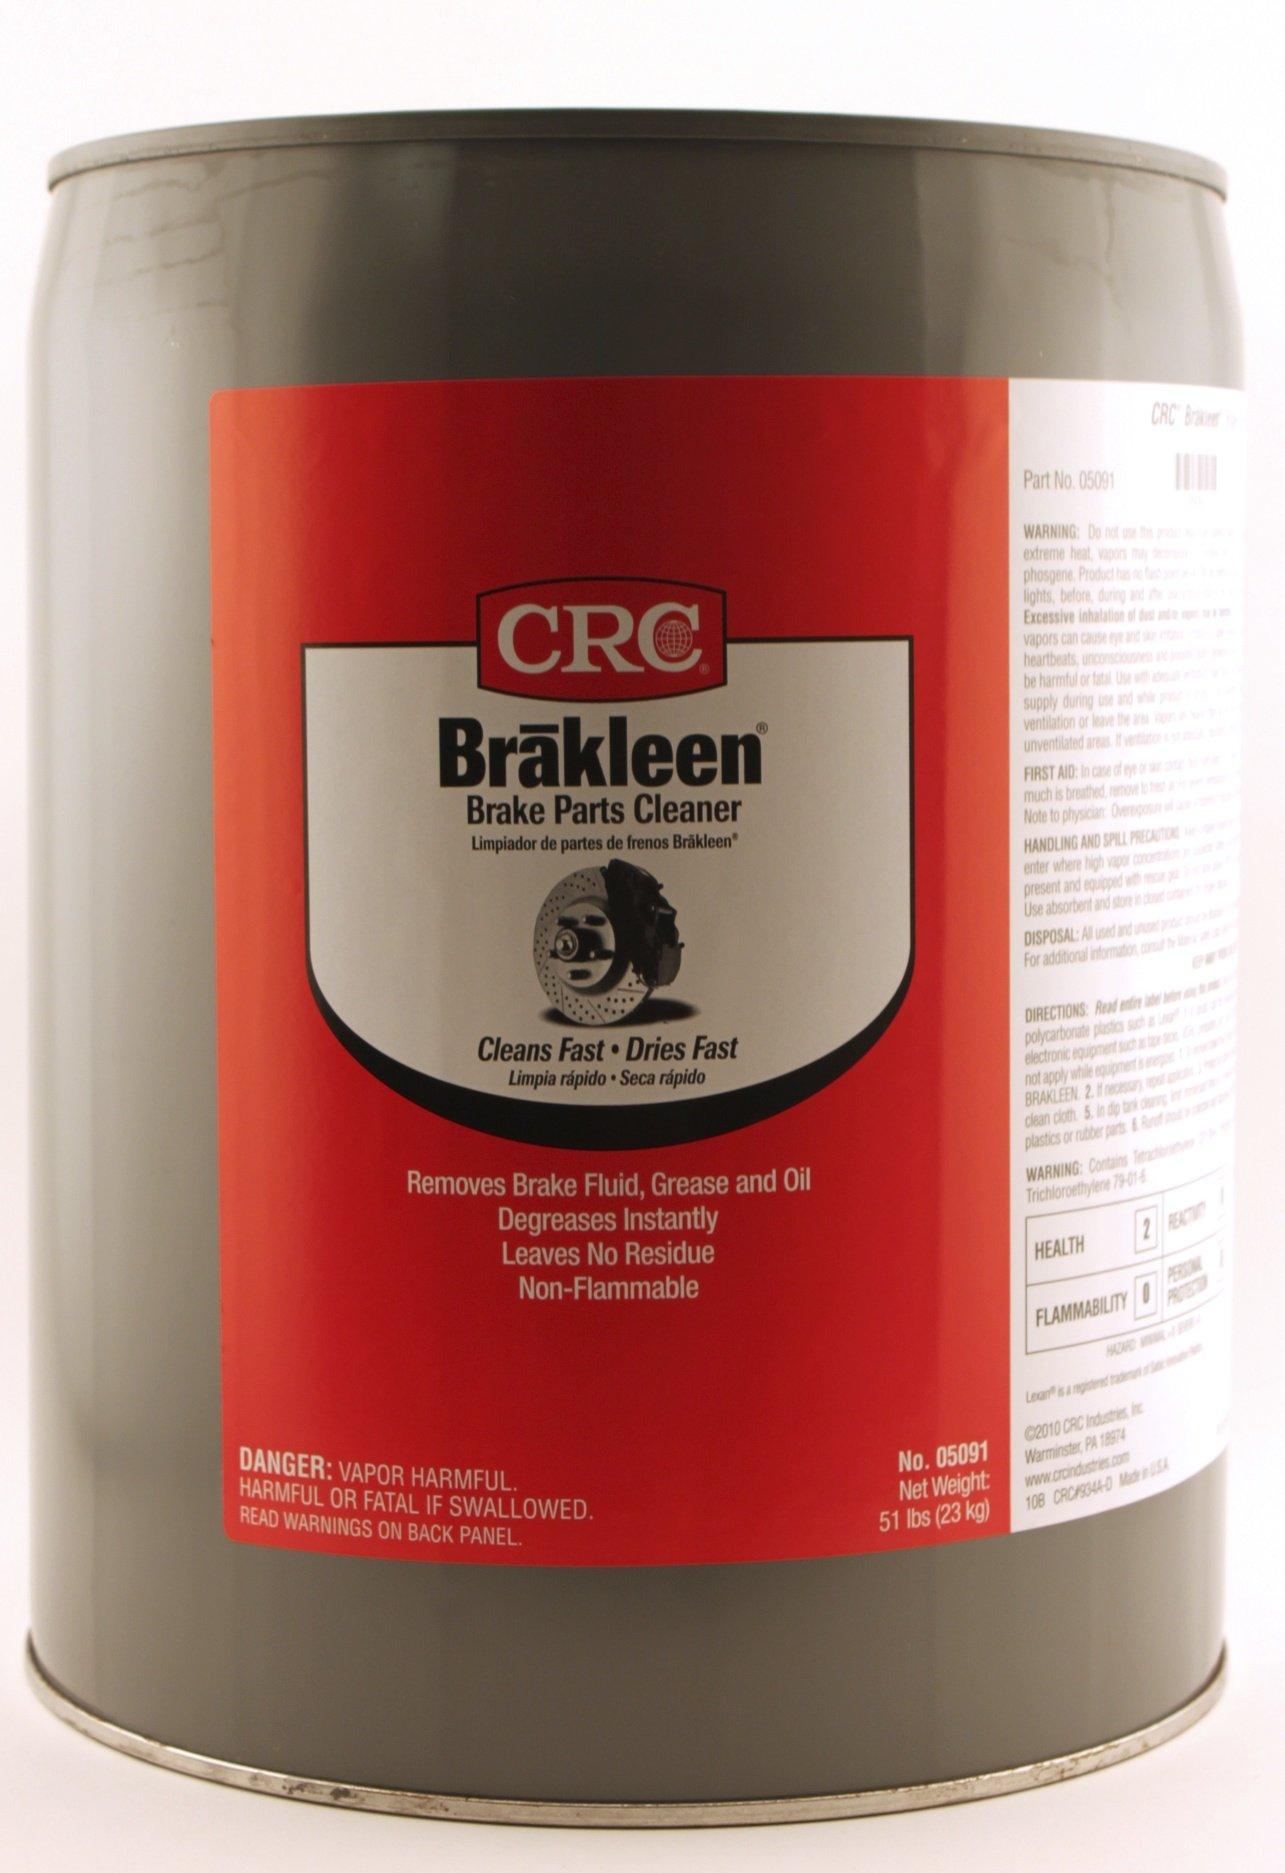 Brakleen Brake Parts Cleaners - brakleen brake parts cleaner